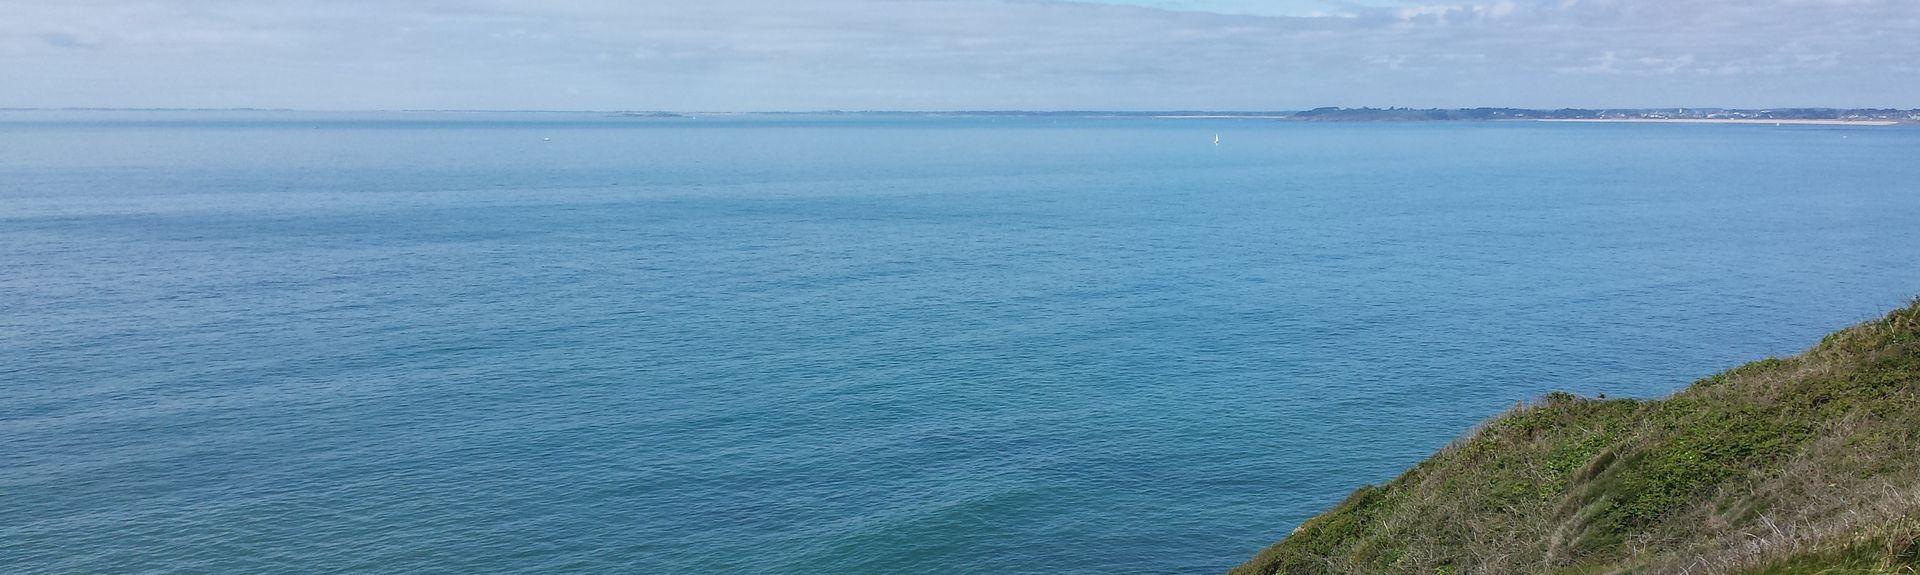 Séné, Morbihan, Frankreich